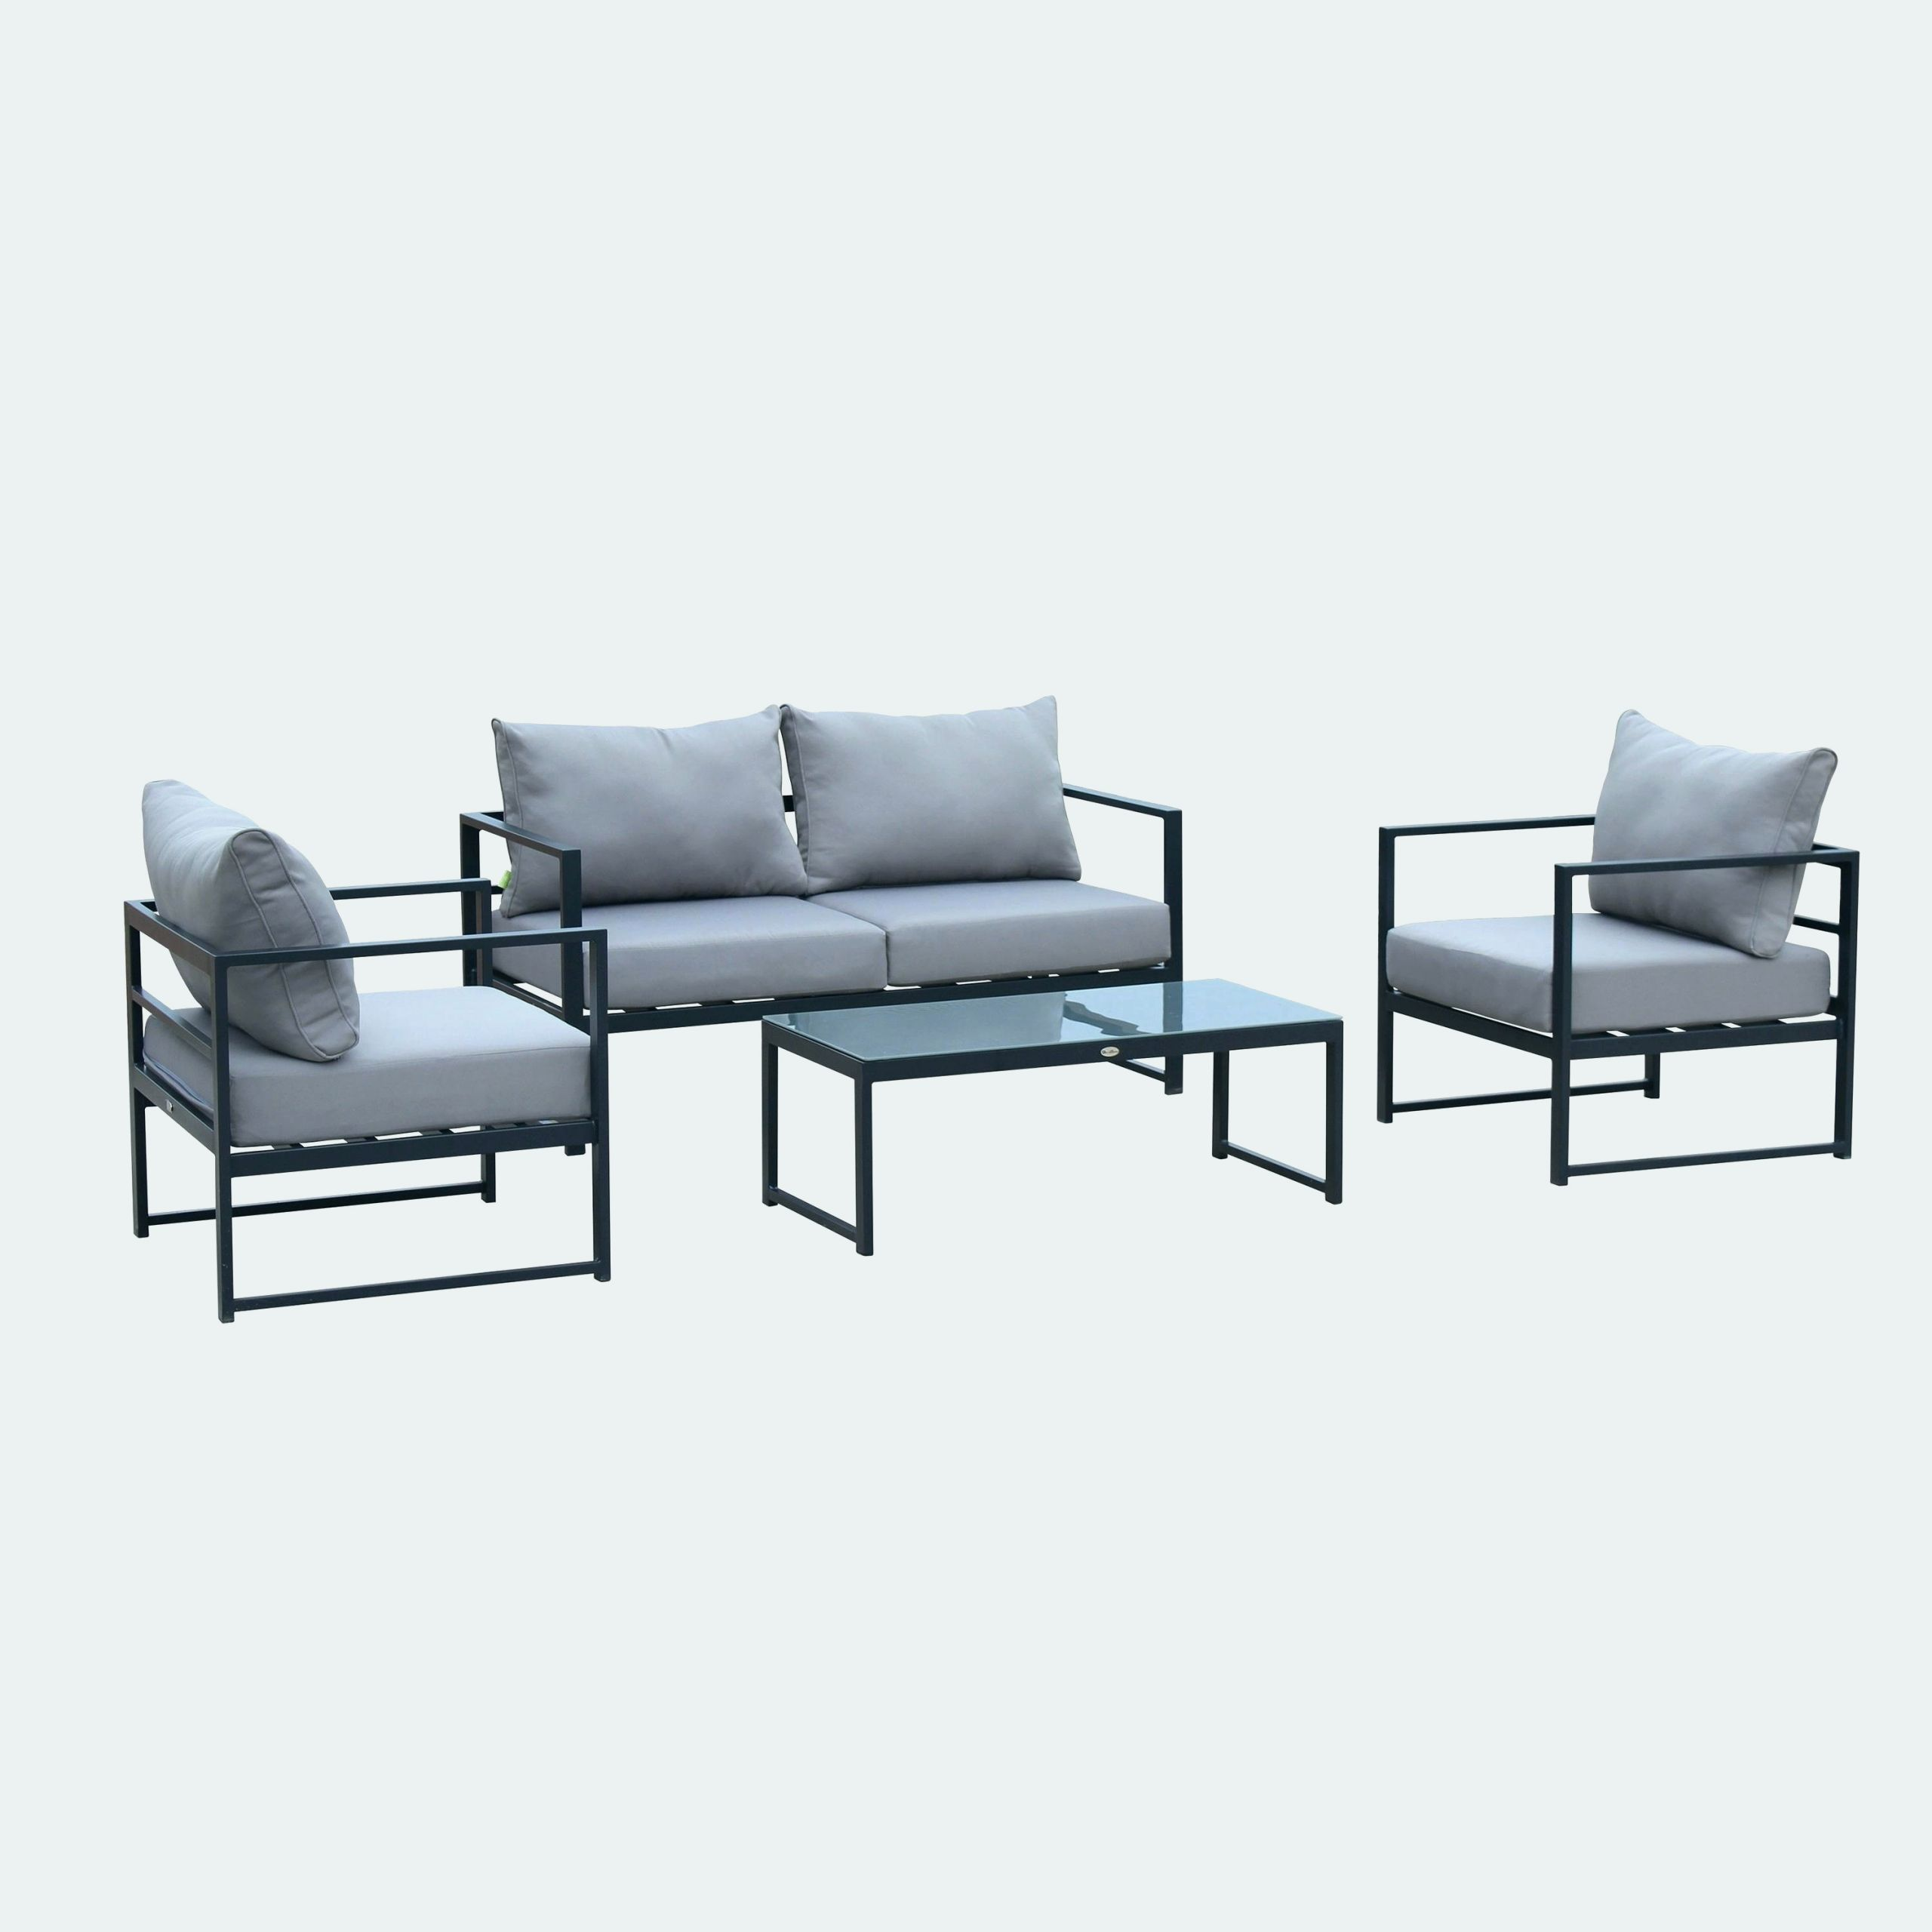 chaise jardin leroy merlin salon resine luxe de elegant chaise jardin leroy merlin salon resine luxe de concernant blooma